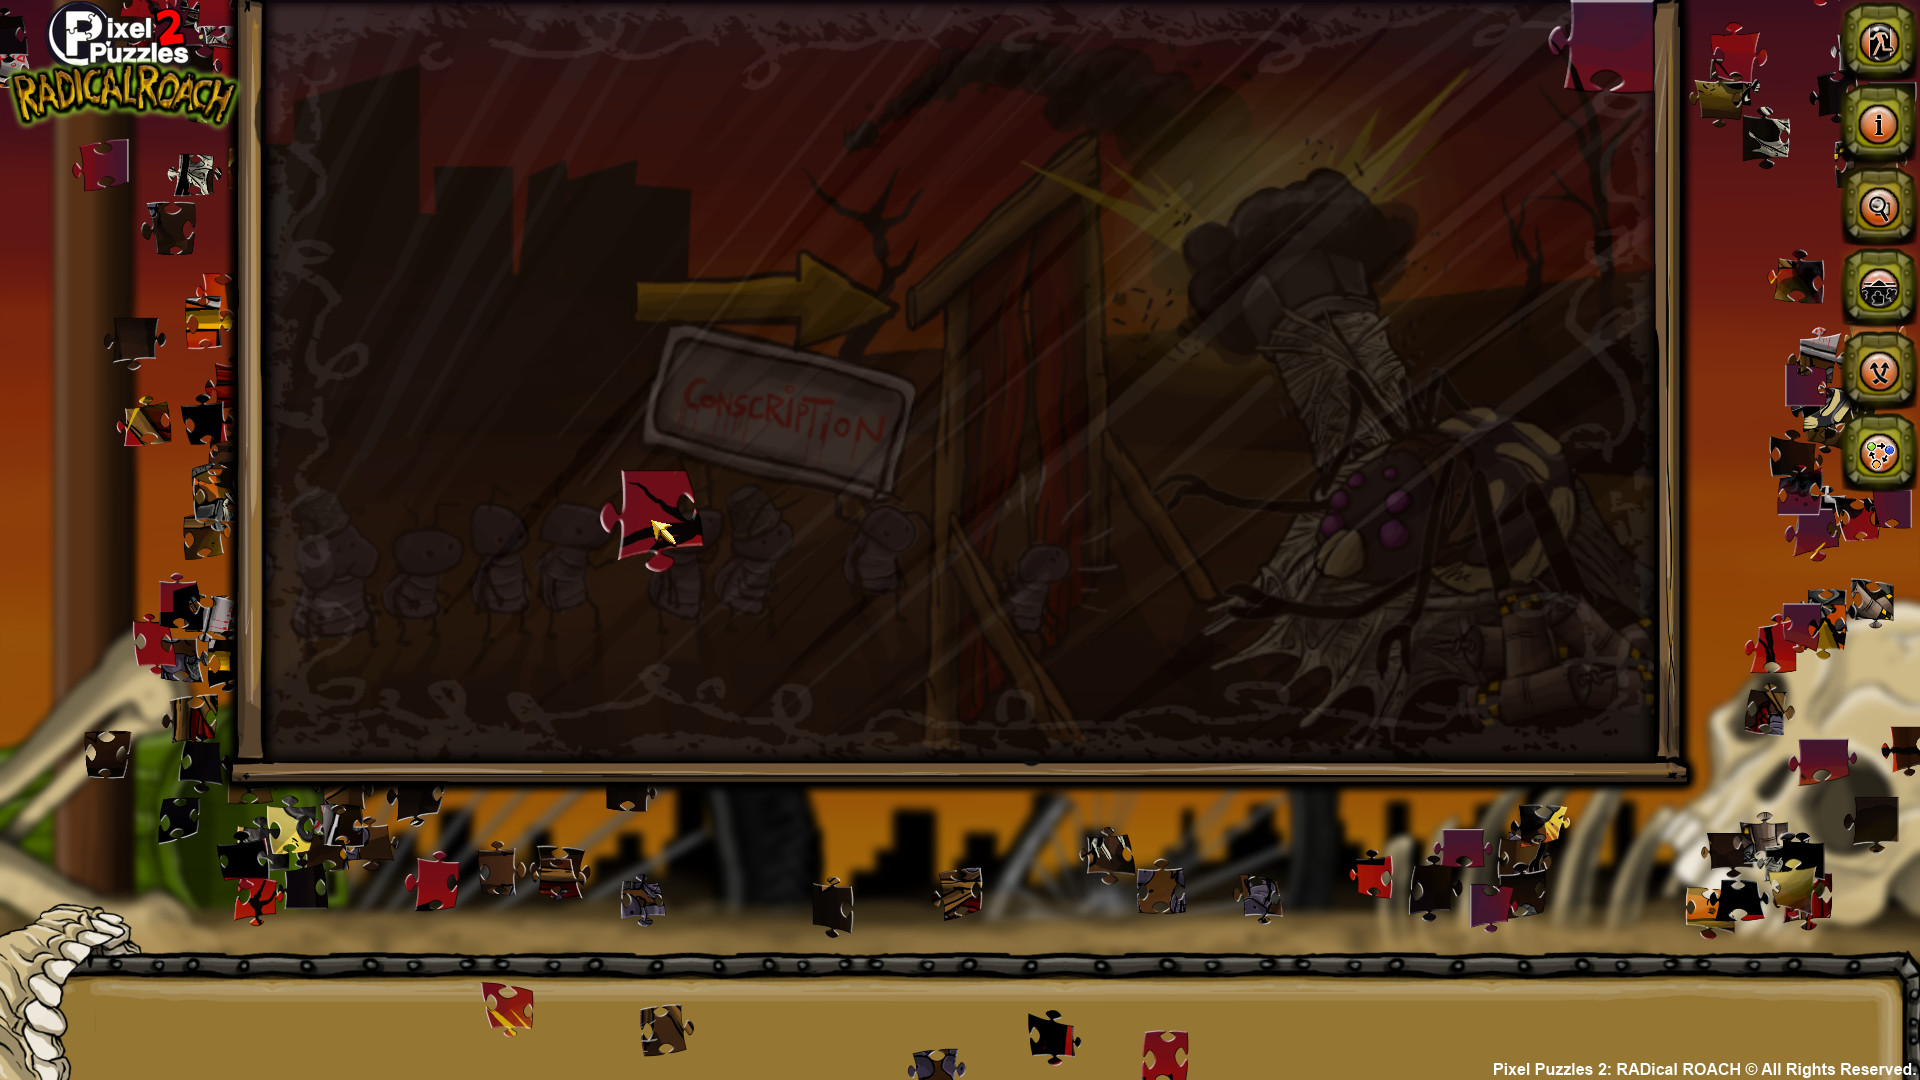 Pixel Puzzles 2: RADical ROACH screenshot